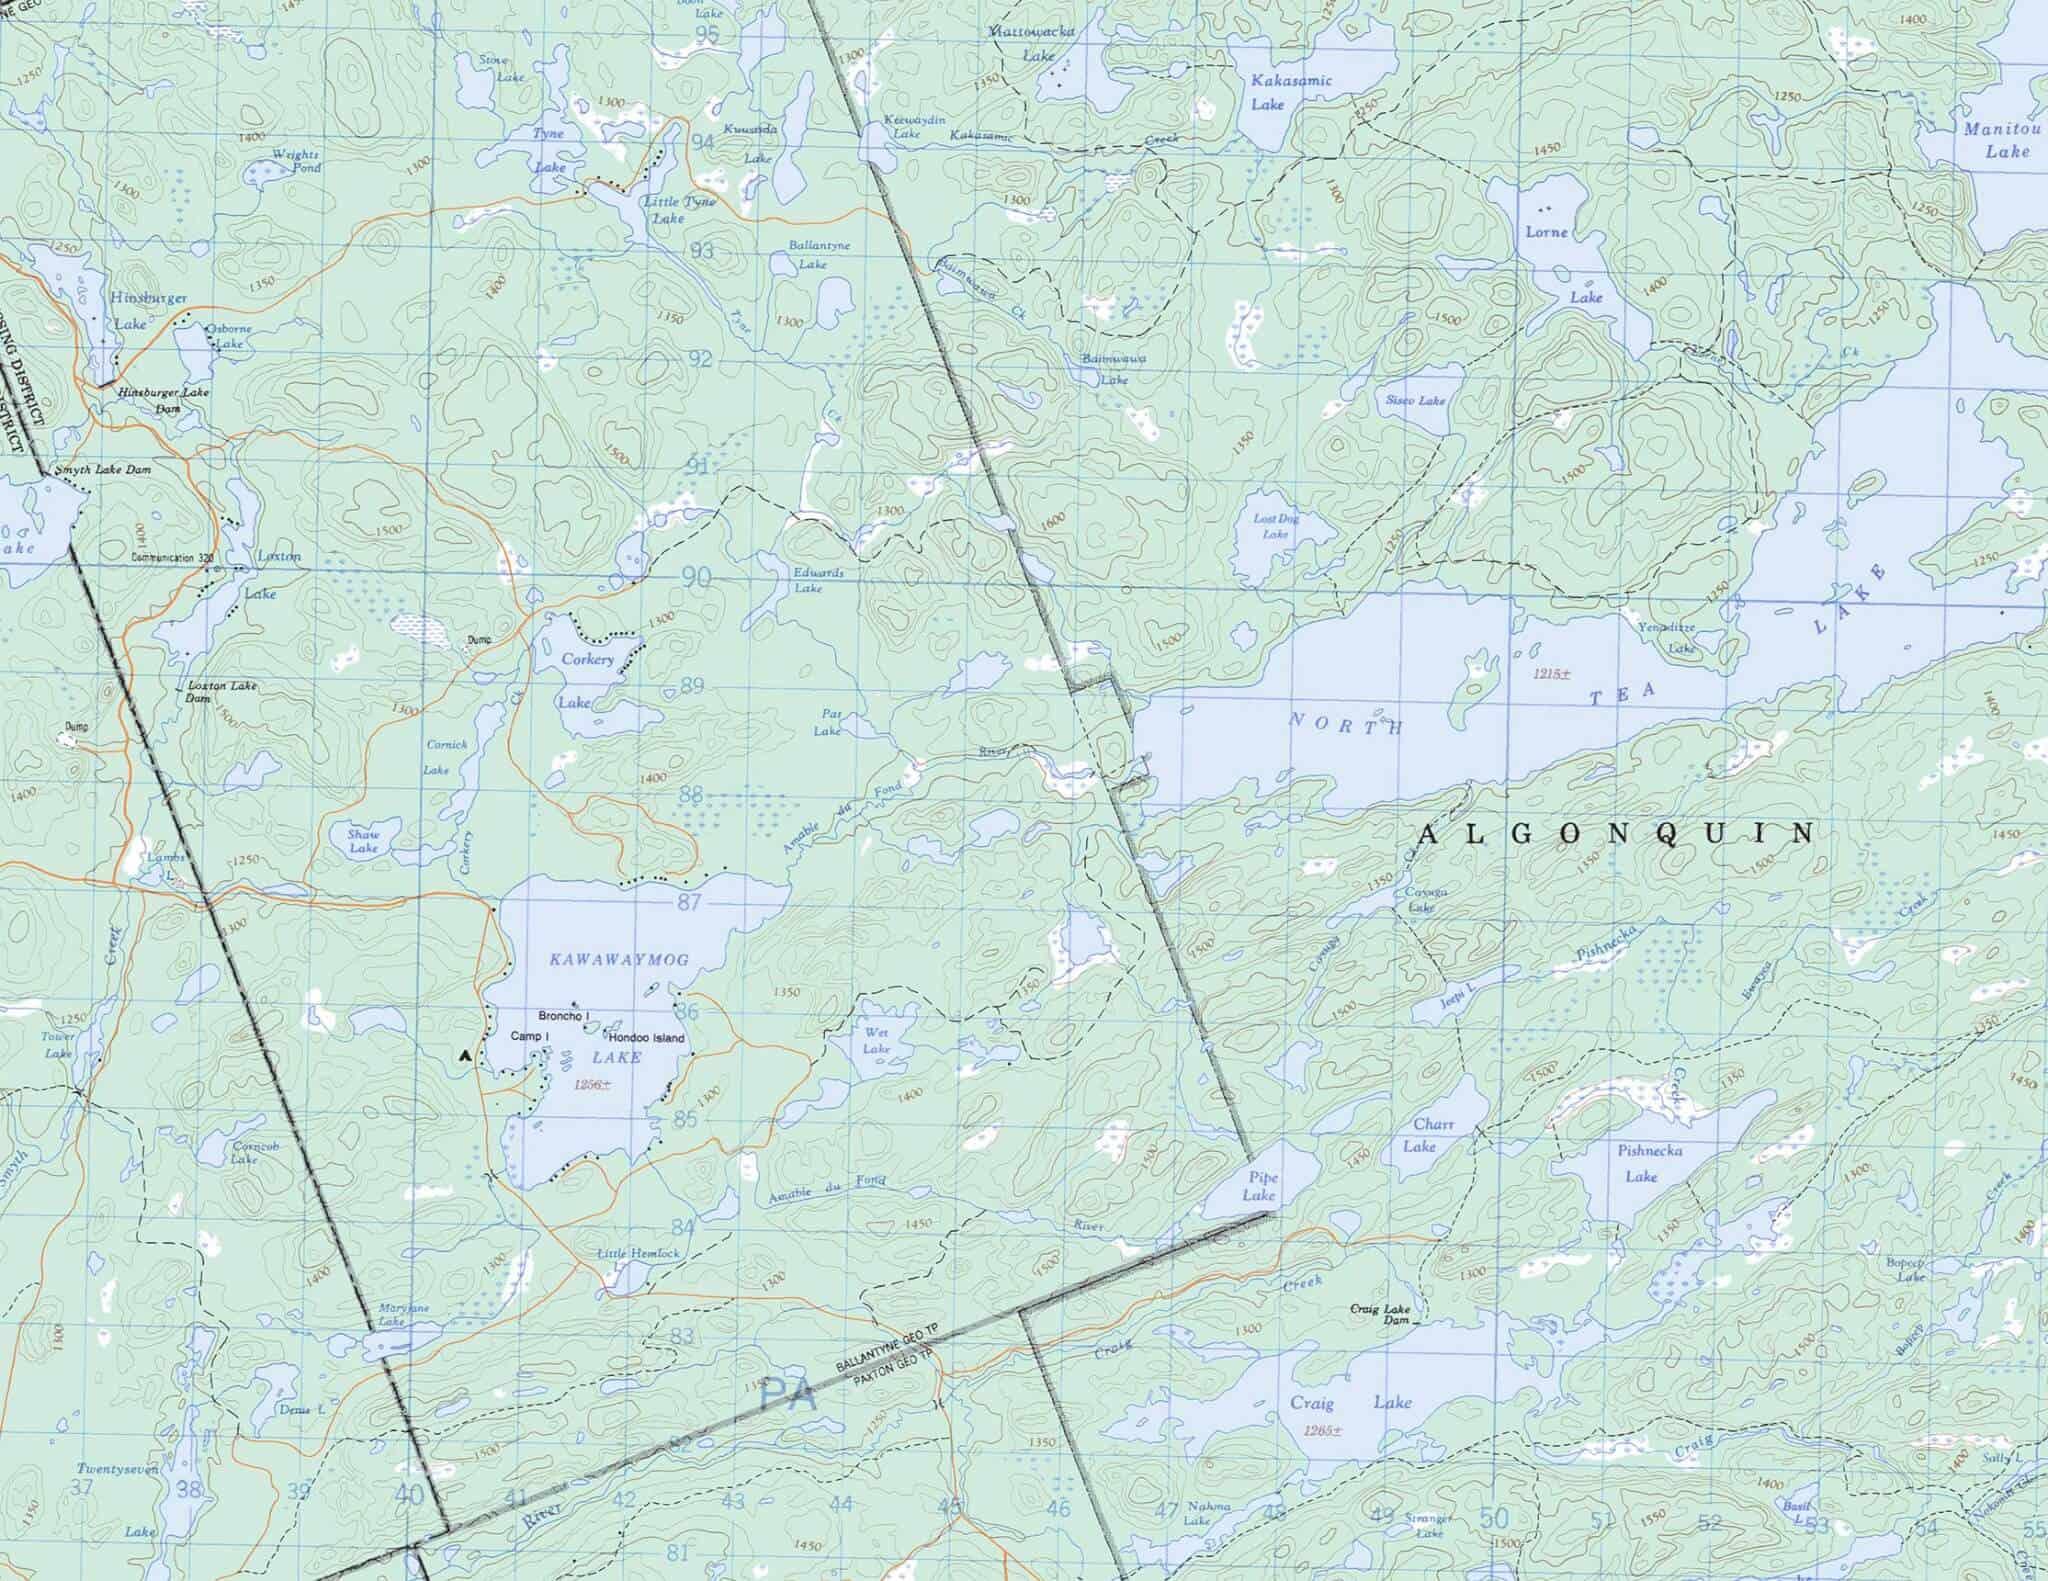 Algonquin Park Maps - Voyageur Quest Outfitting and